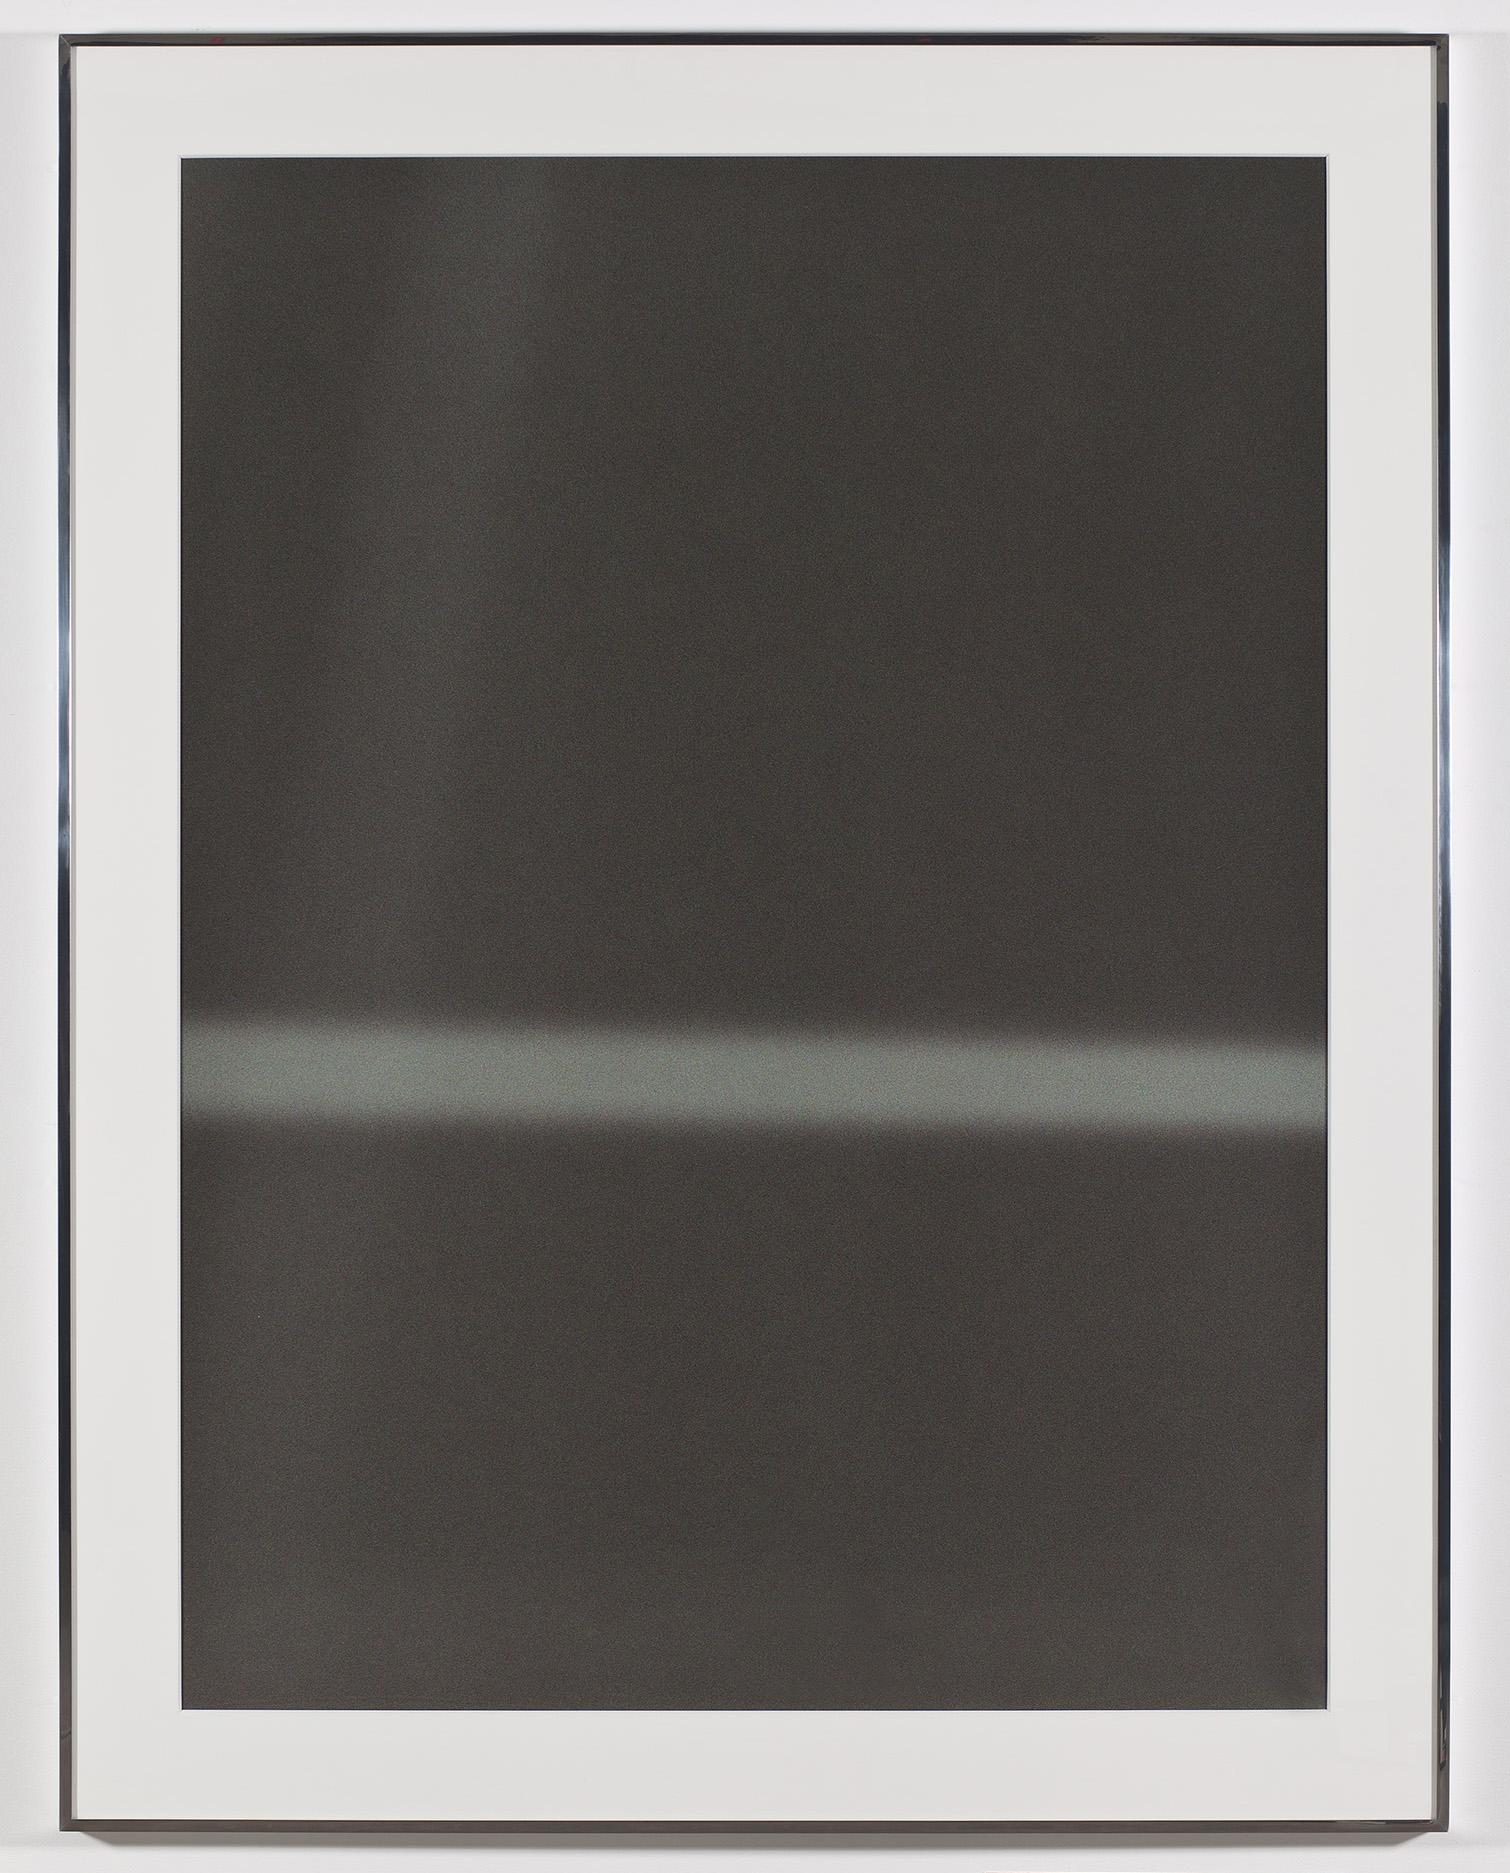 Transparency (Negative) [Kodak Portra 400NC Em. No. 2001: May 17–24, 2009 LAX/IAD/DME DME/IAD/LAX]    2011   Epson Ultrachrome K3 archival ink jet print on Museo Silver Rag Paper  68 x 52 1/4 inches   Transparencies, 2008–2014